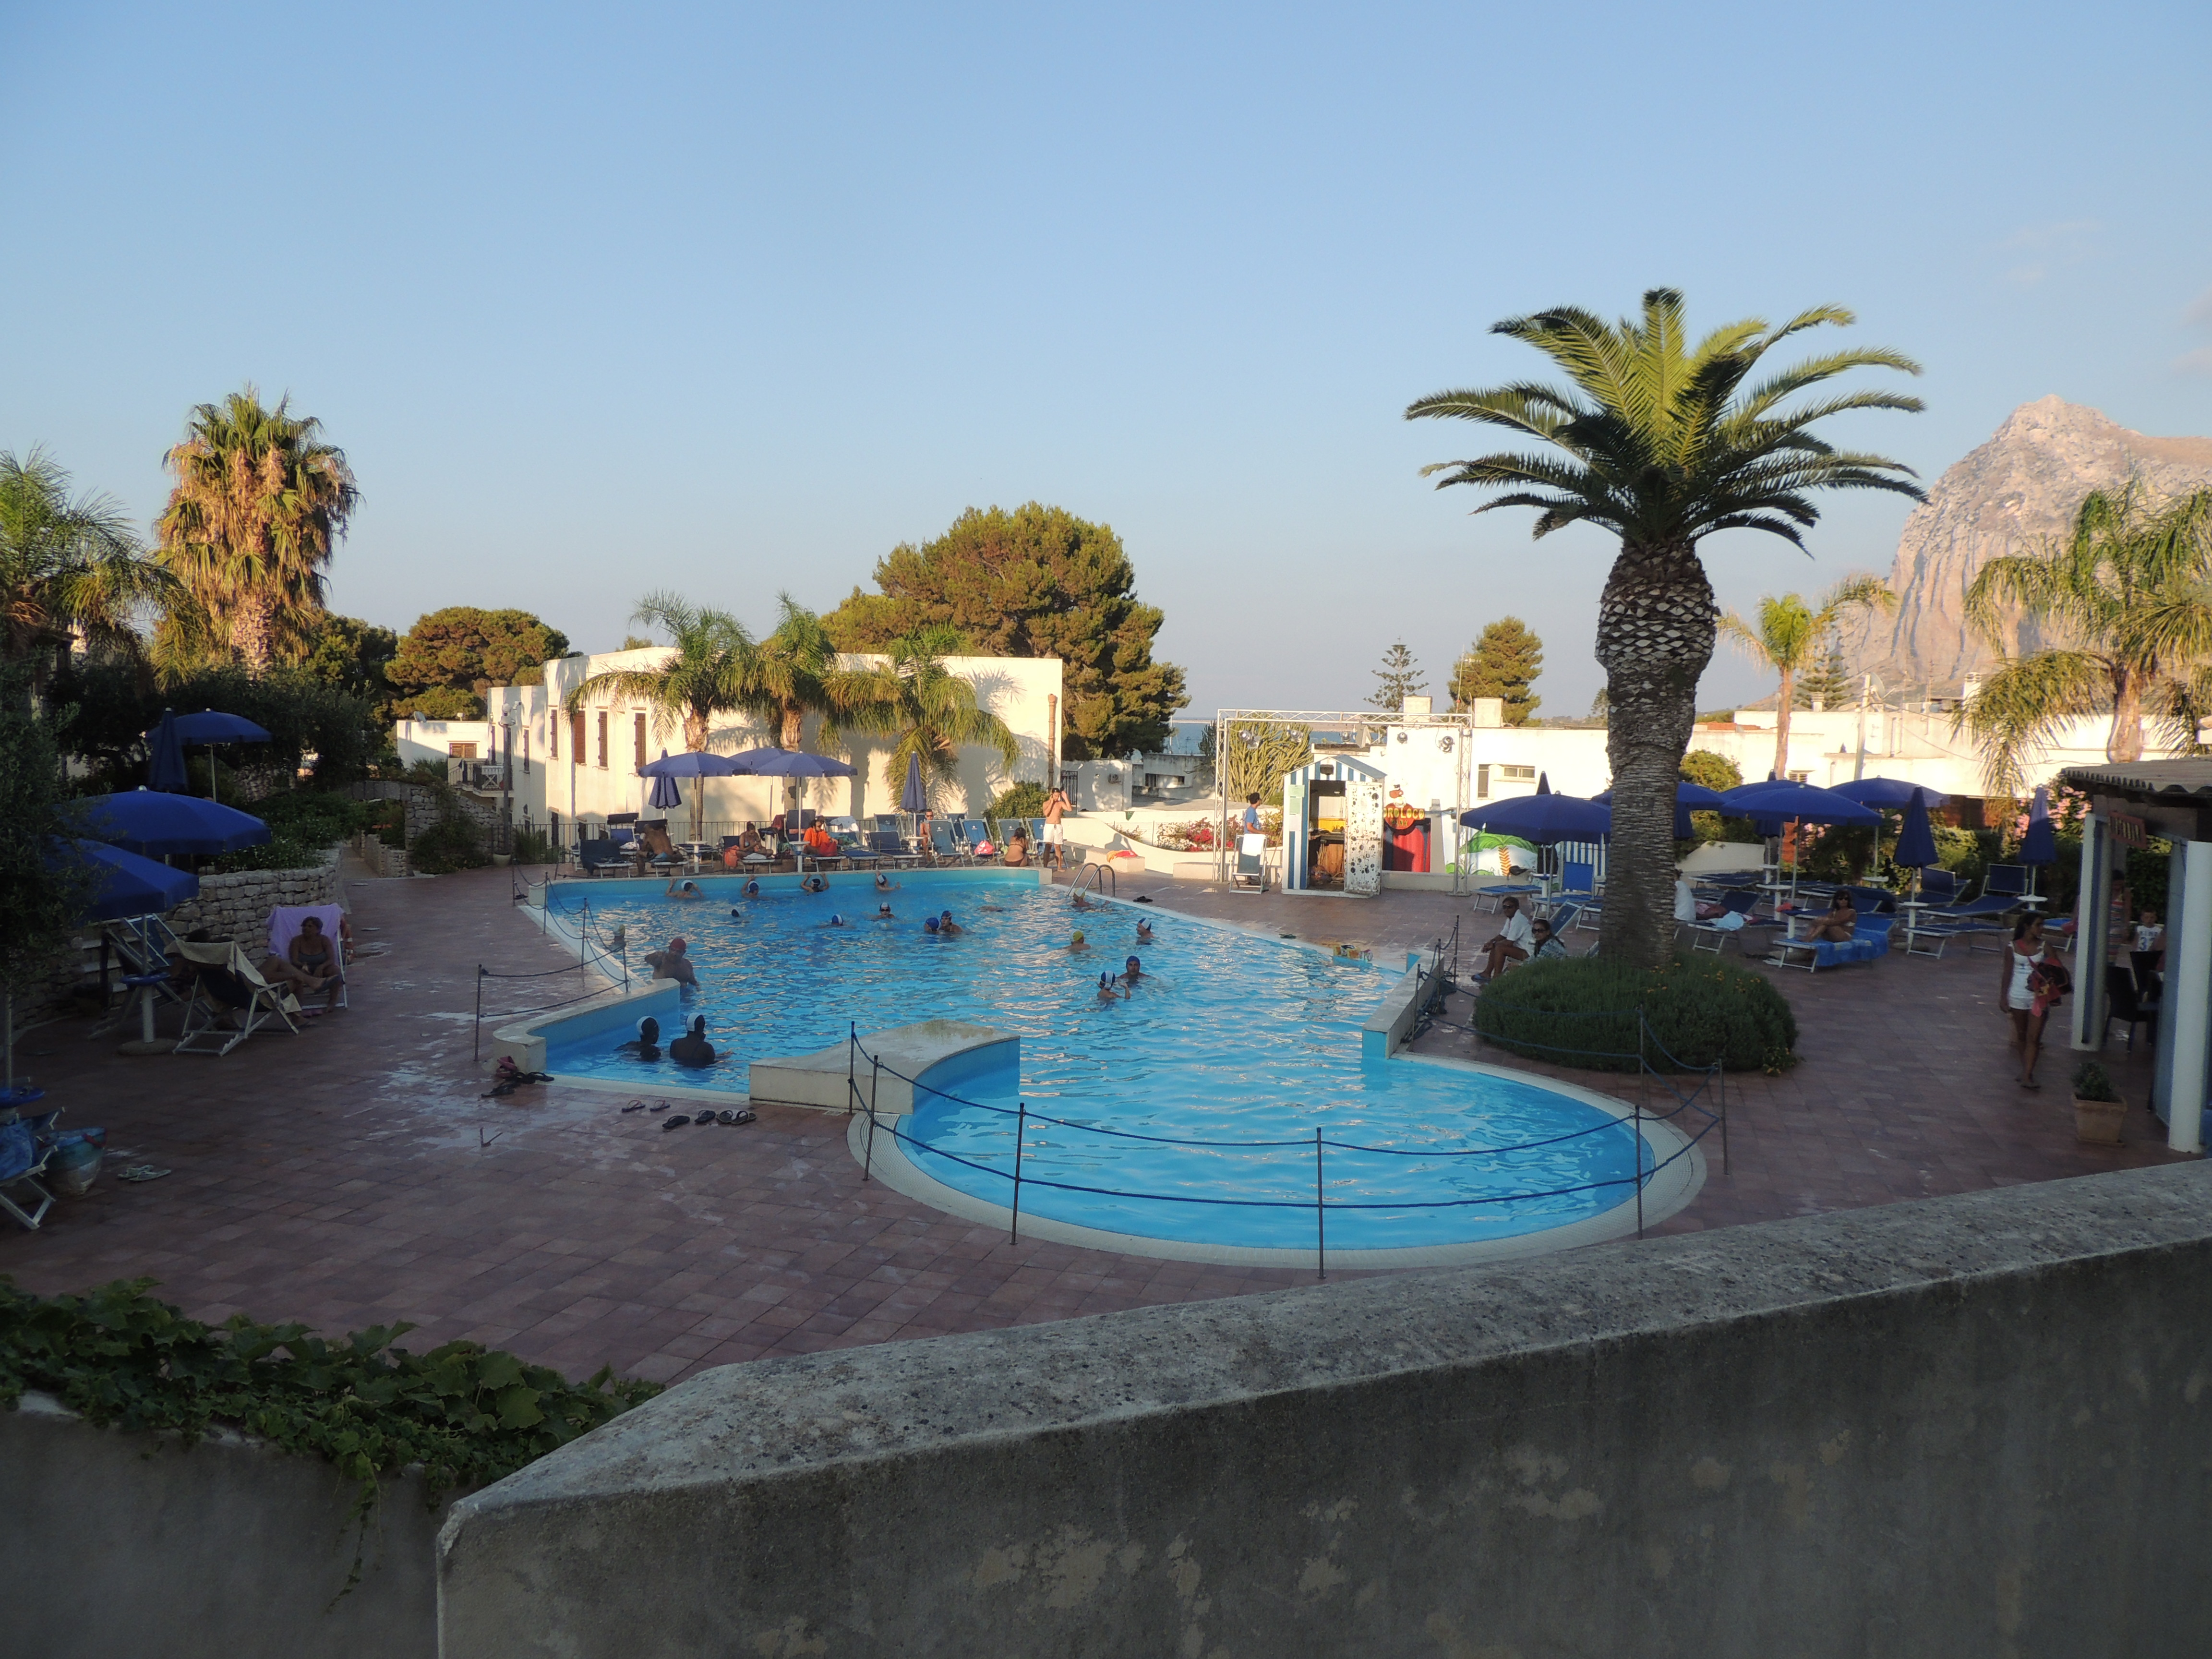 Holiday house San Vito Lo Capo - Dorf Calamancina - 5-Zimmer-Wohnung (2420963), San Vito Lo Capo, Trapani, Sicily, Italy, picture 8